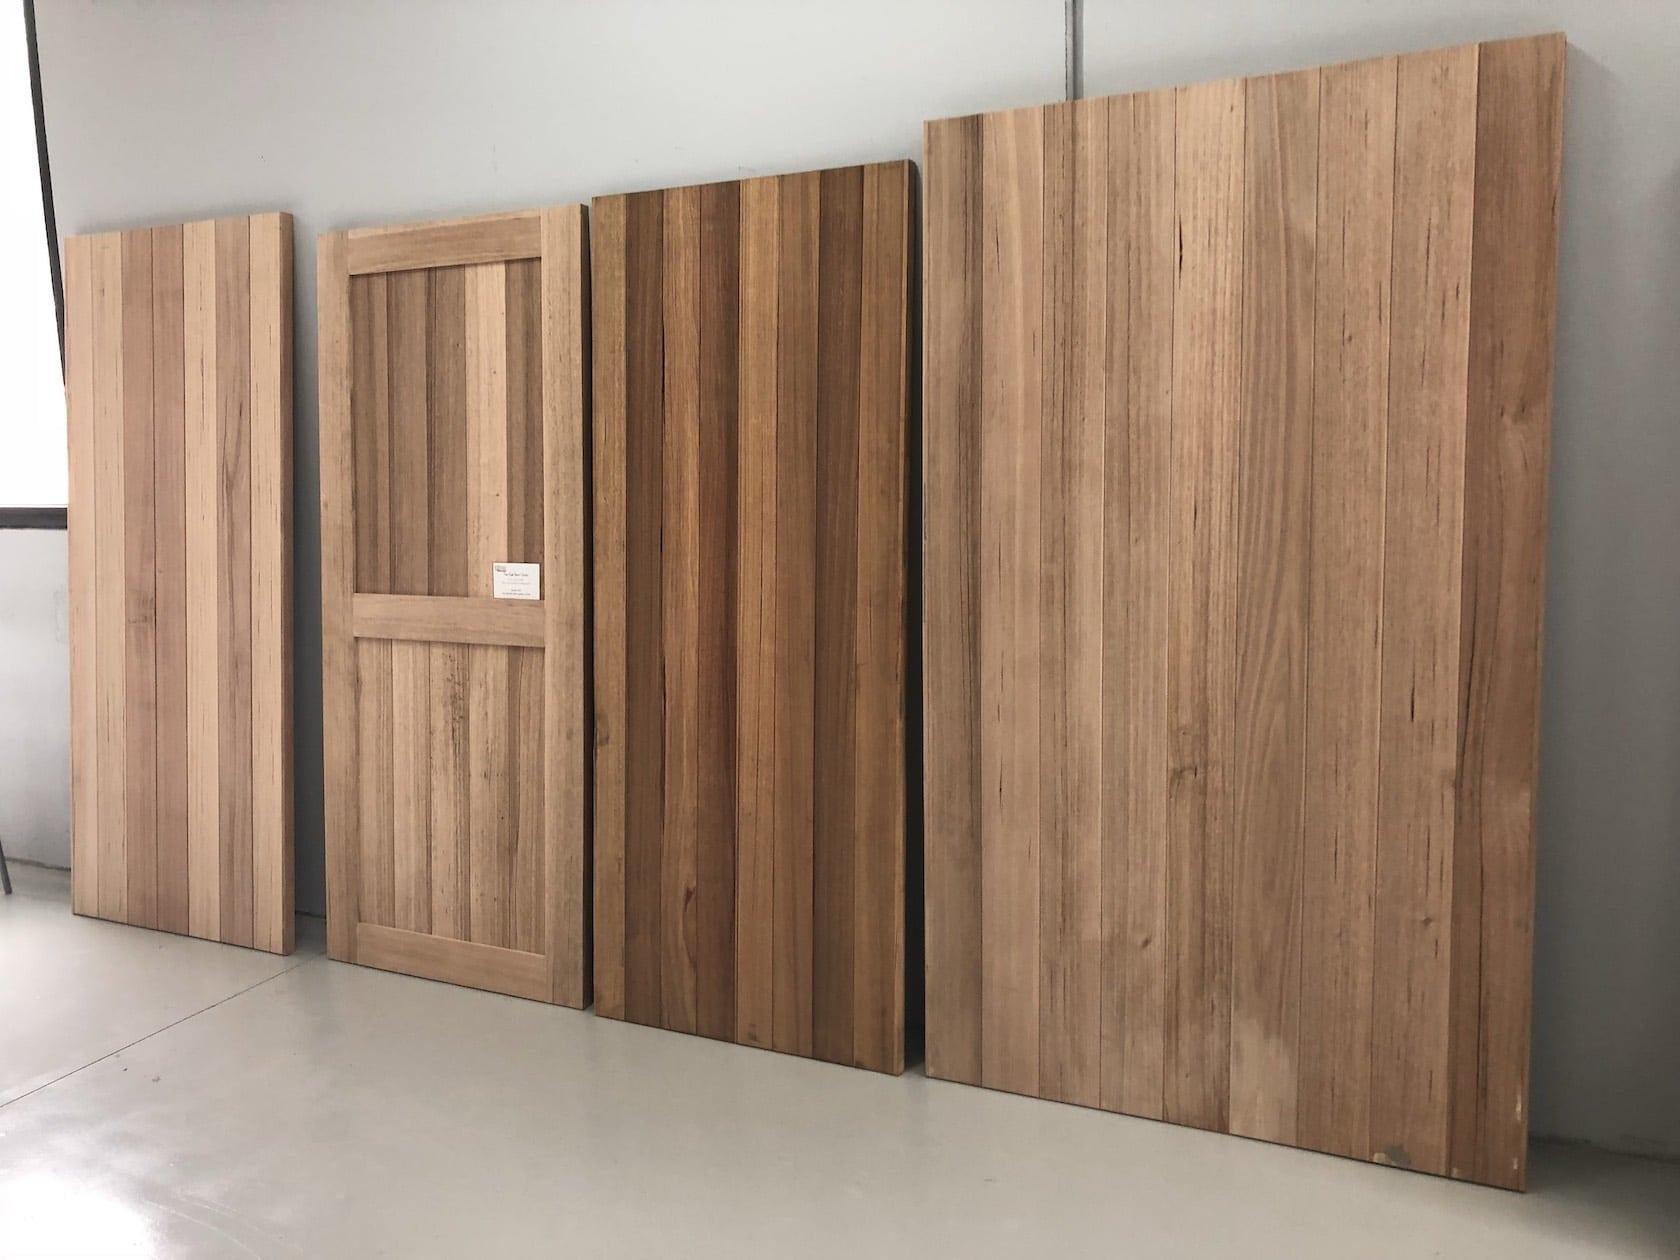 Tasmanian Oak Barn Doors Uptons Group Construction Supplies